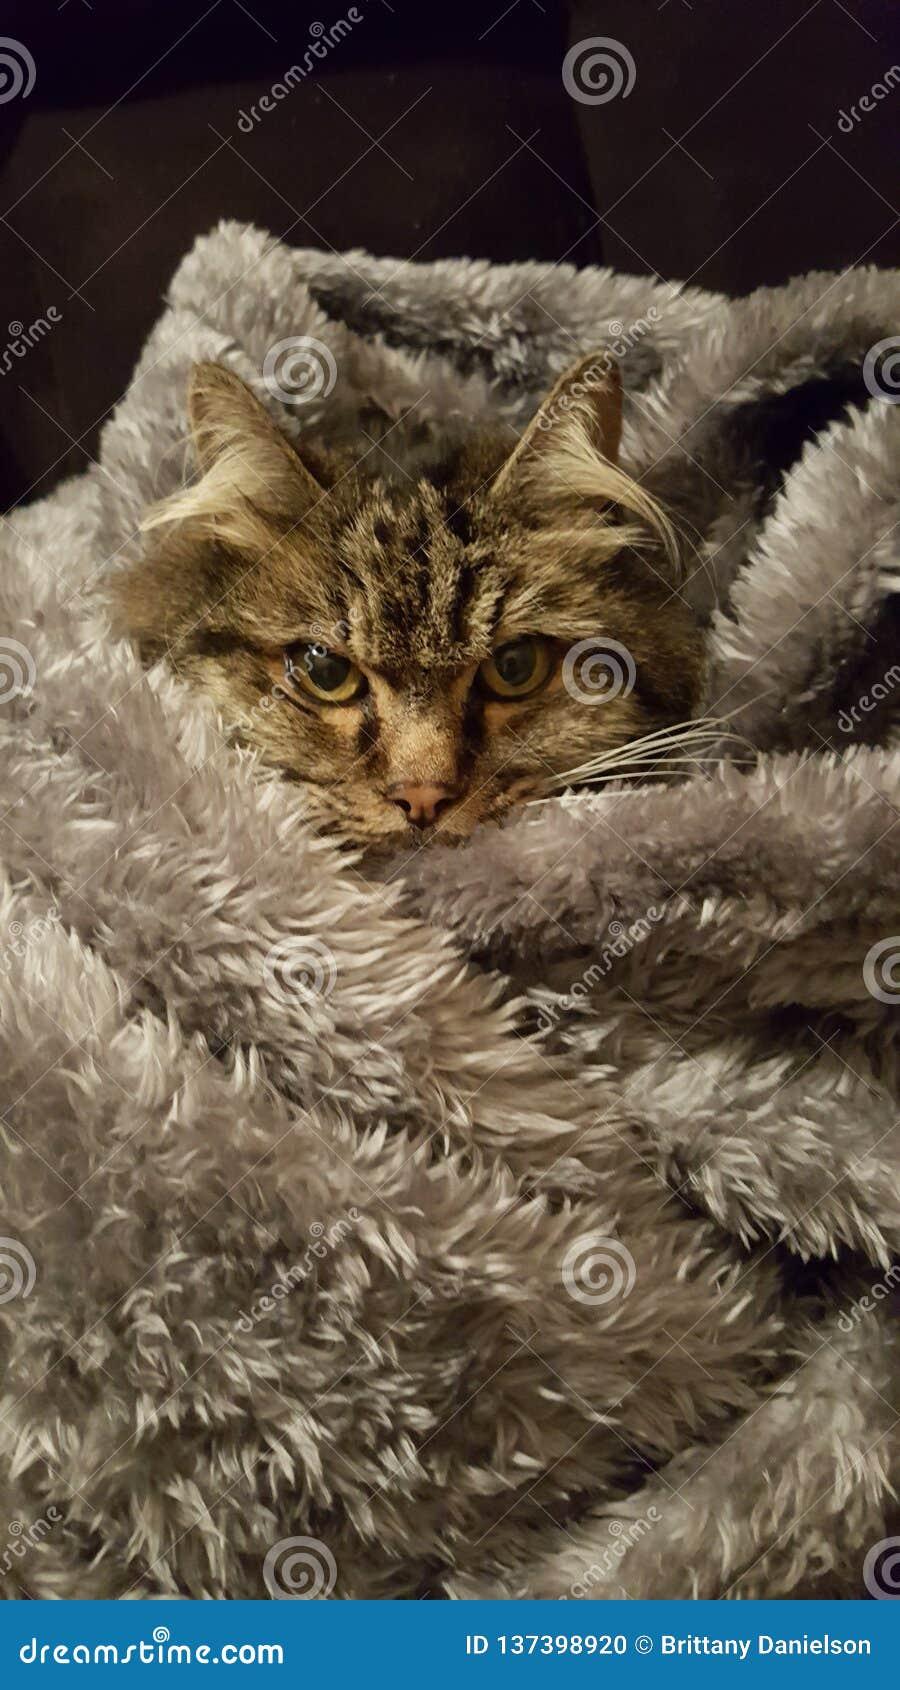 Schmiegt sich die Katze an